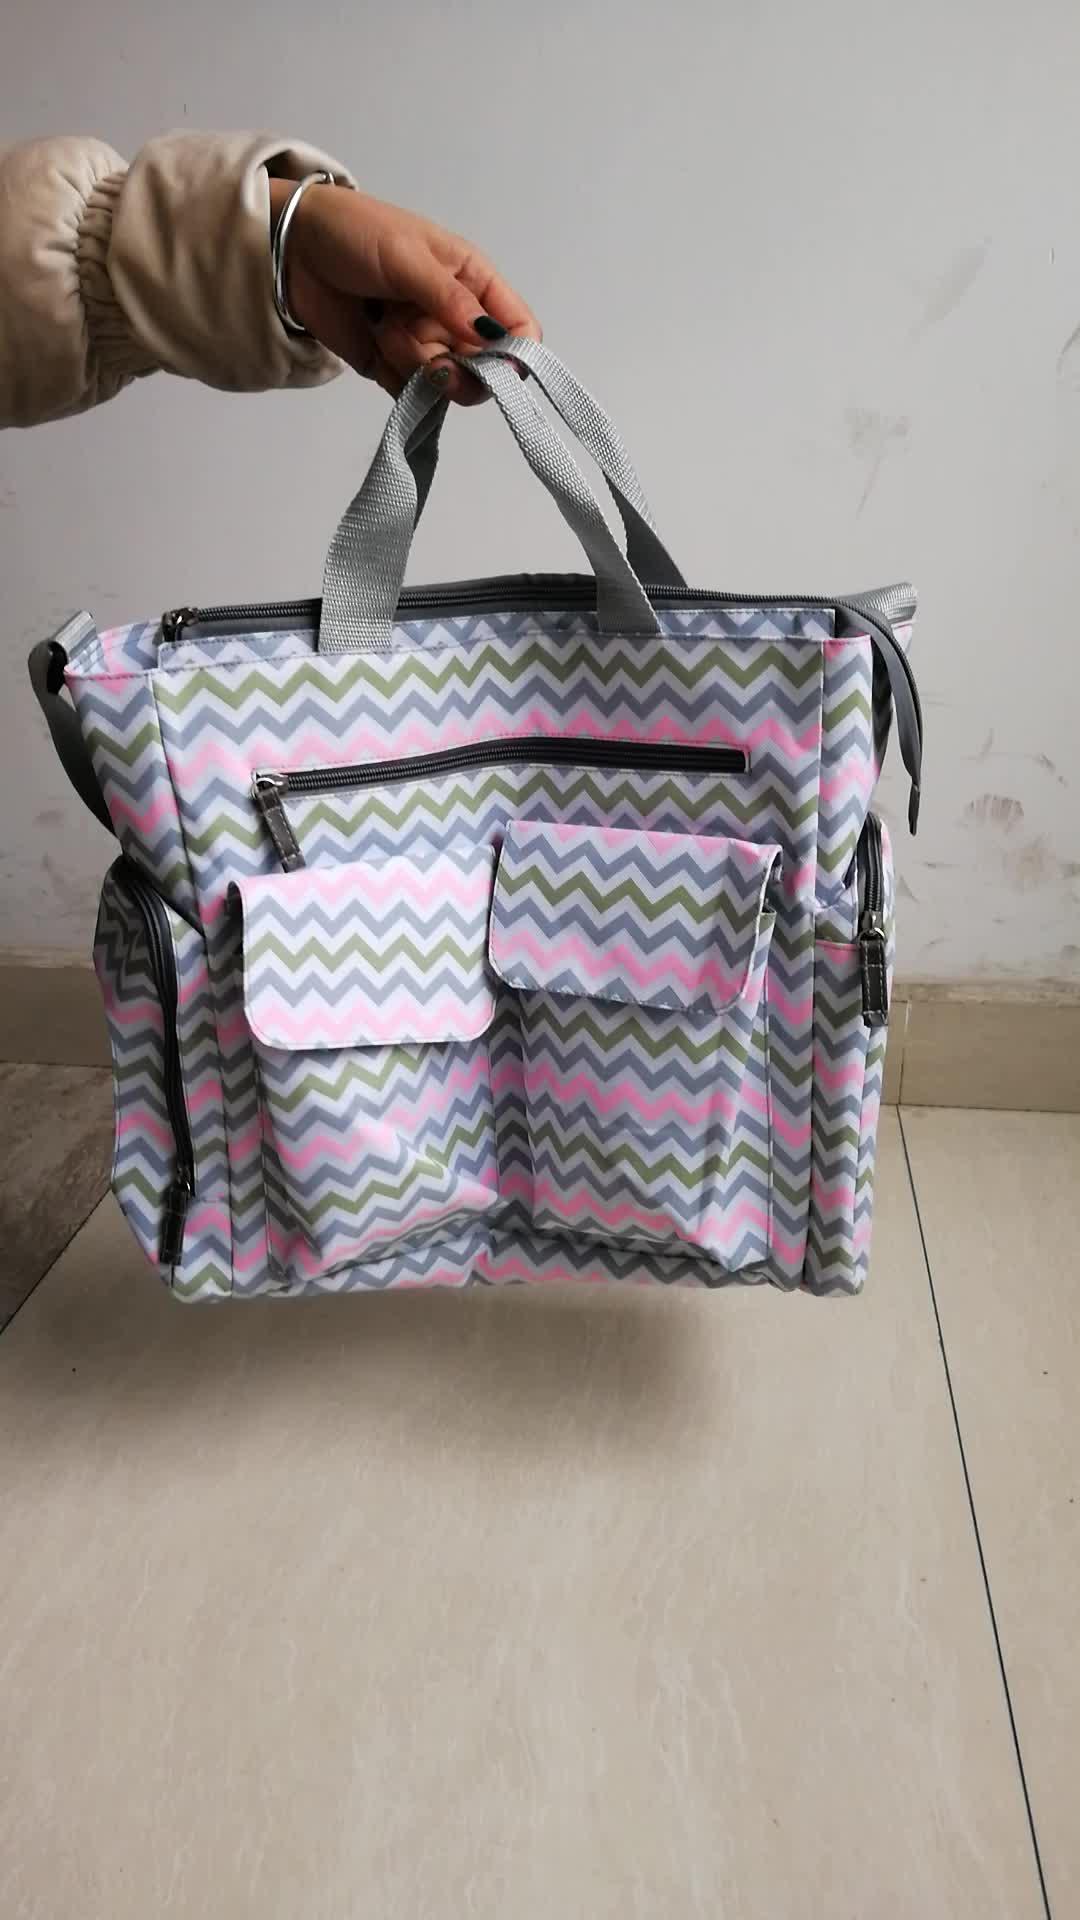 Premium Luxury Beautiful Popular 420D Nylon Pink Stripe Thermal Baby Diaper Bag for Dad